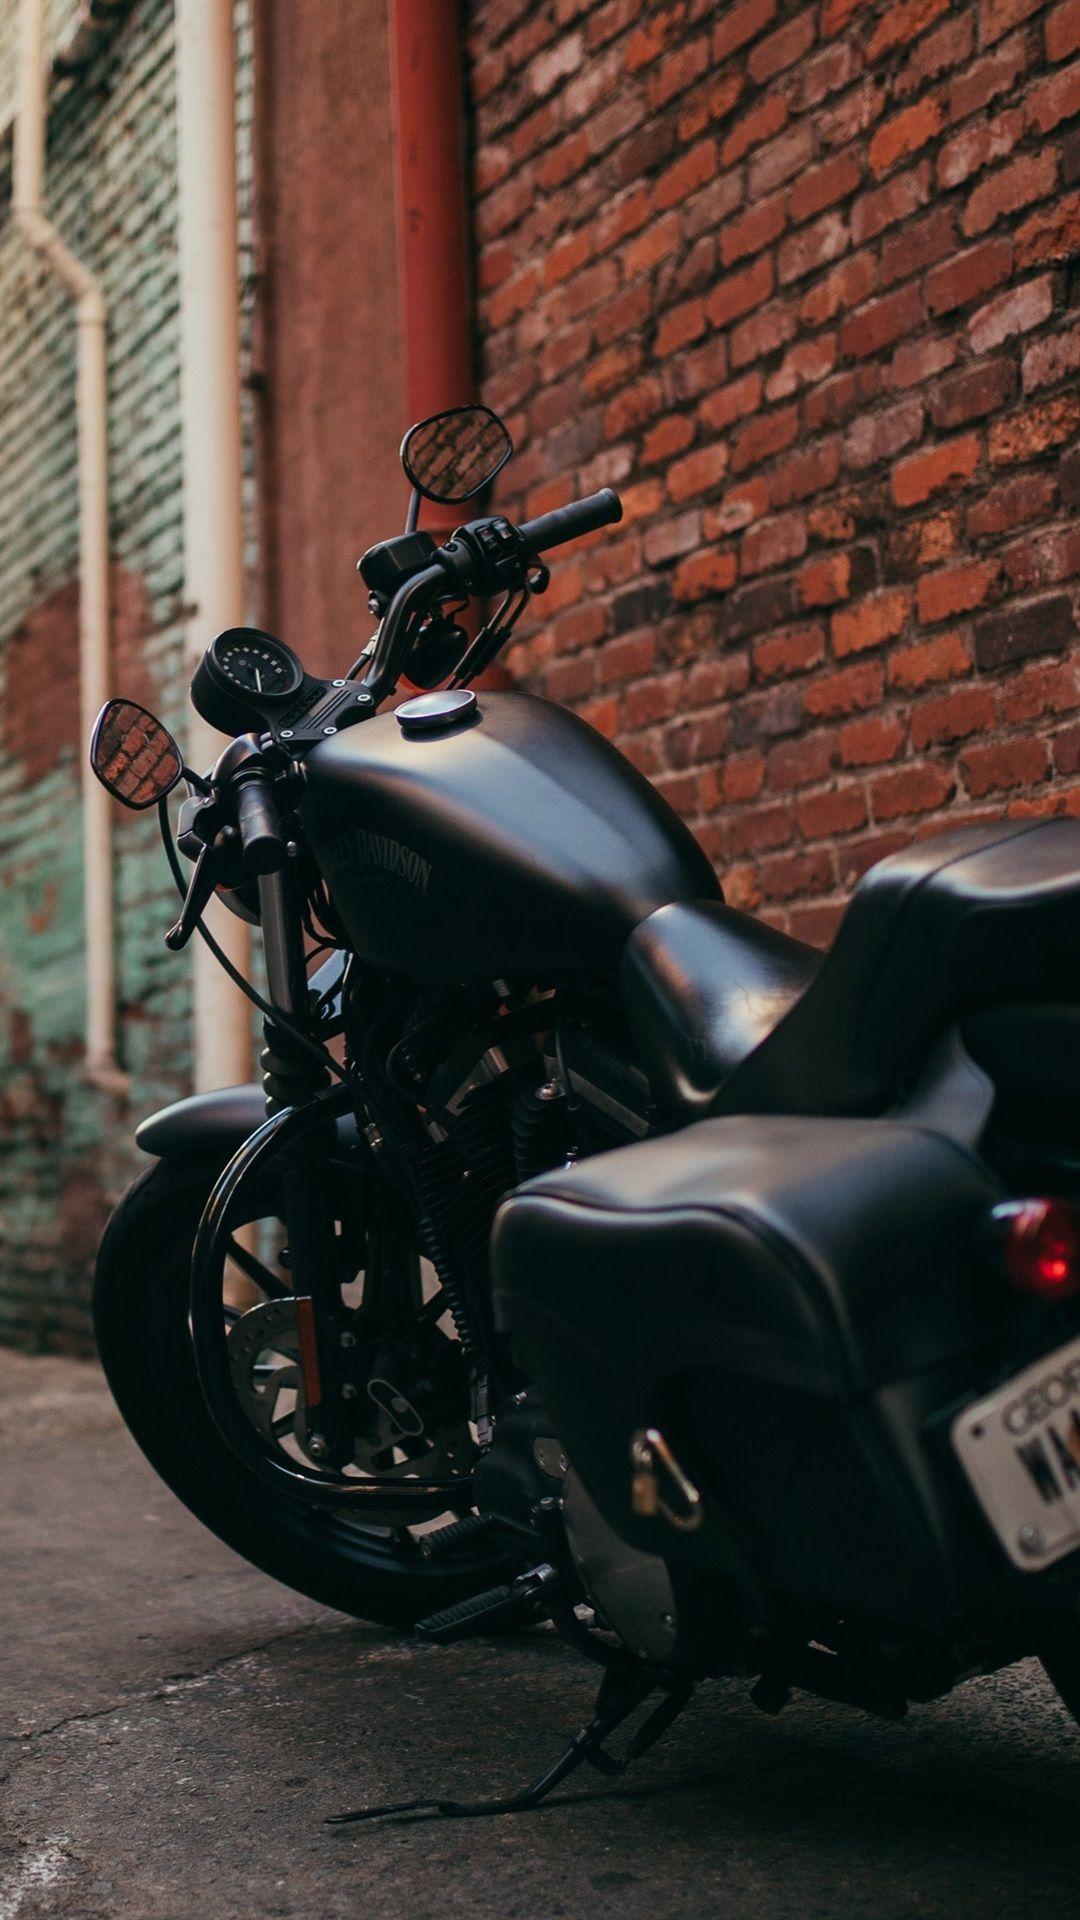 Harley Davidson Wallpaper Ios In 2020 Motorcycle Wallpaper Harley Davidson Wallpaper Harley Davidson